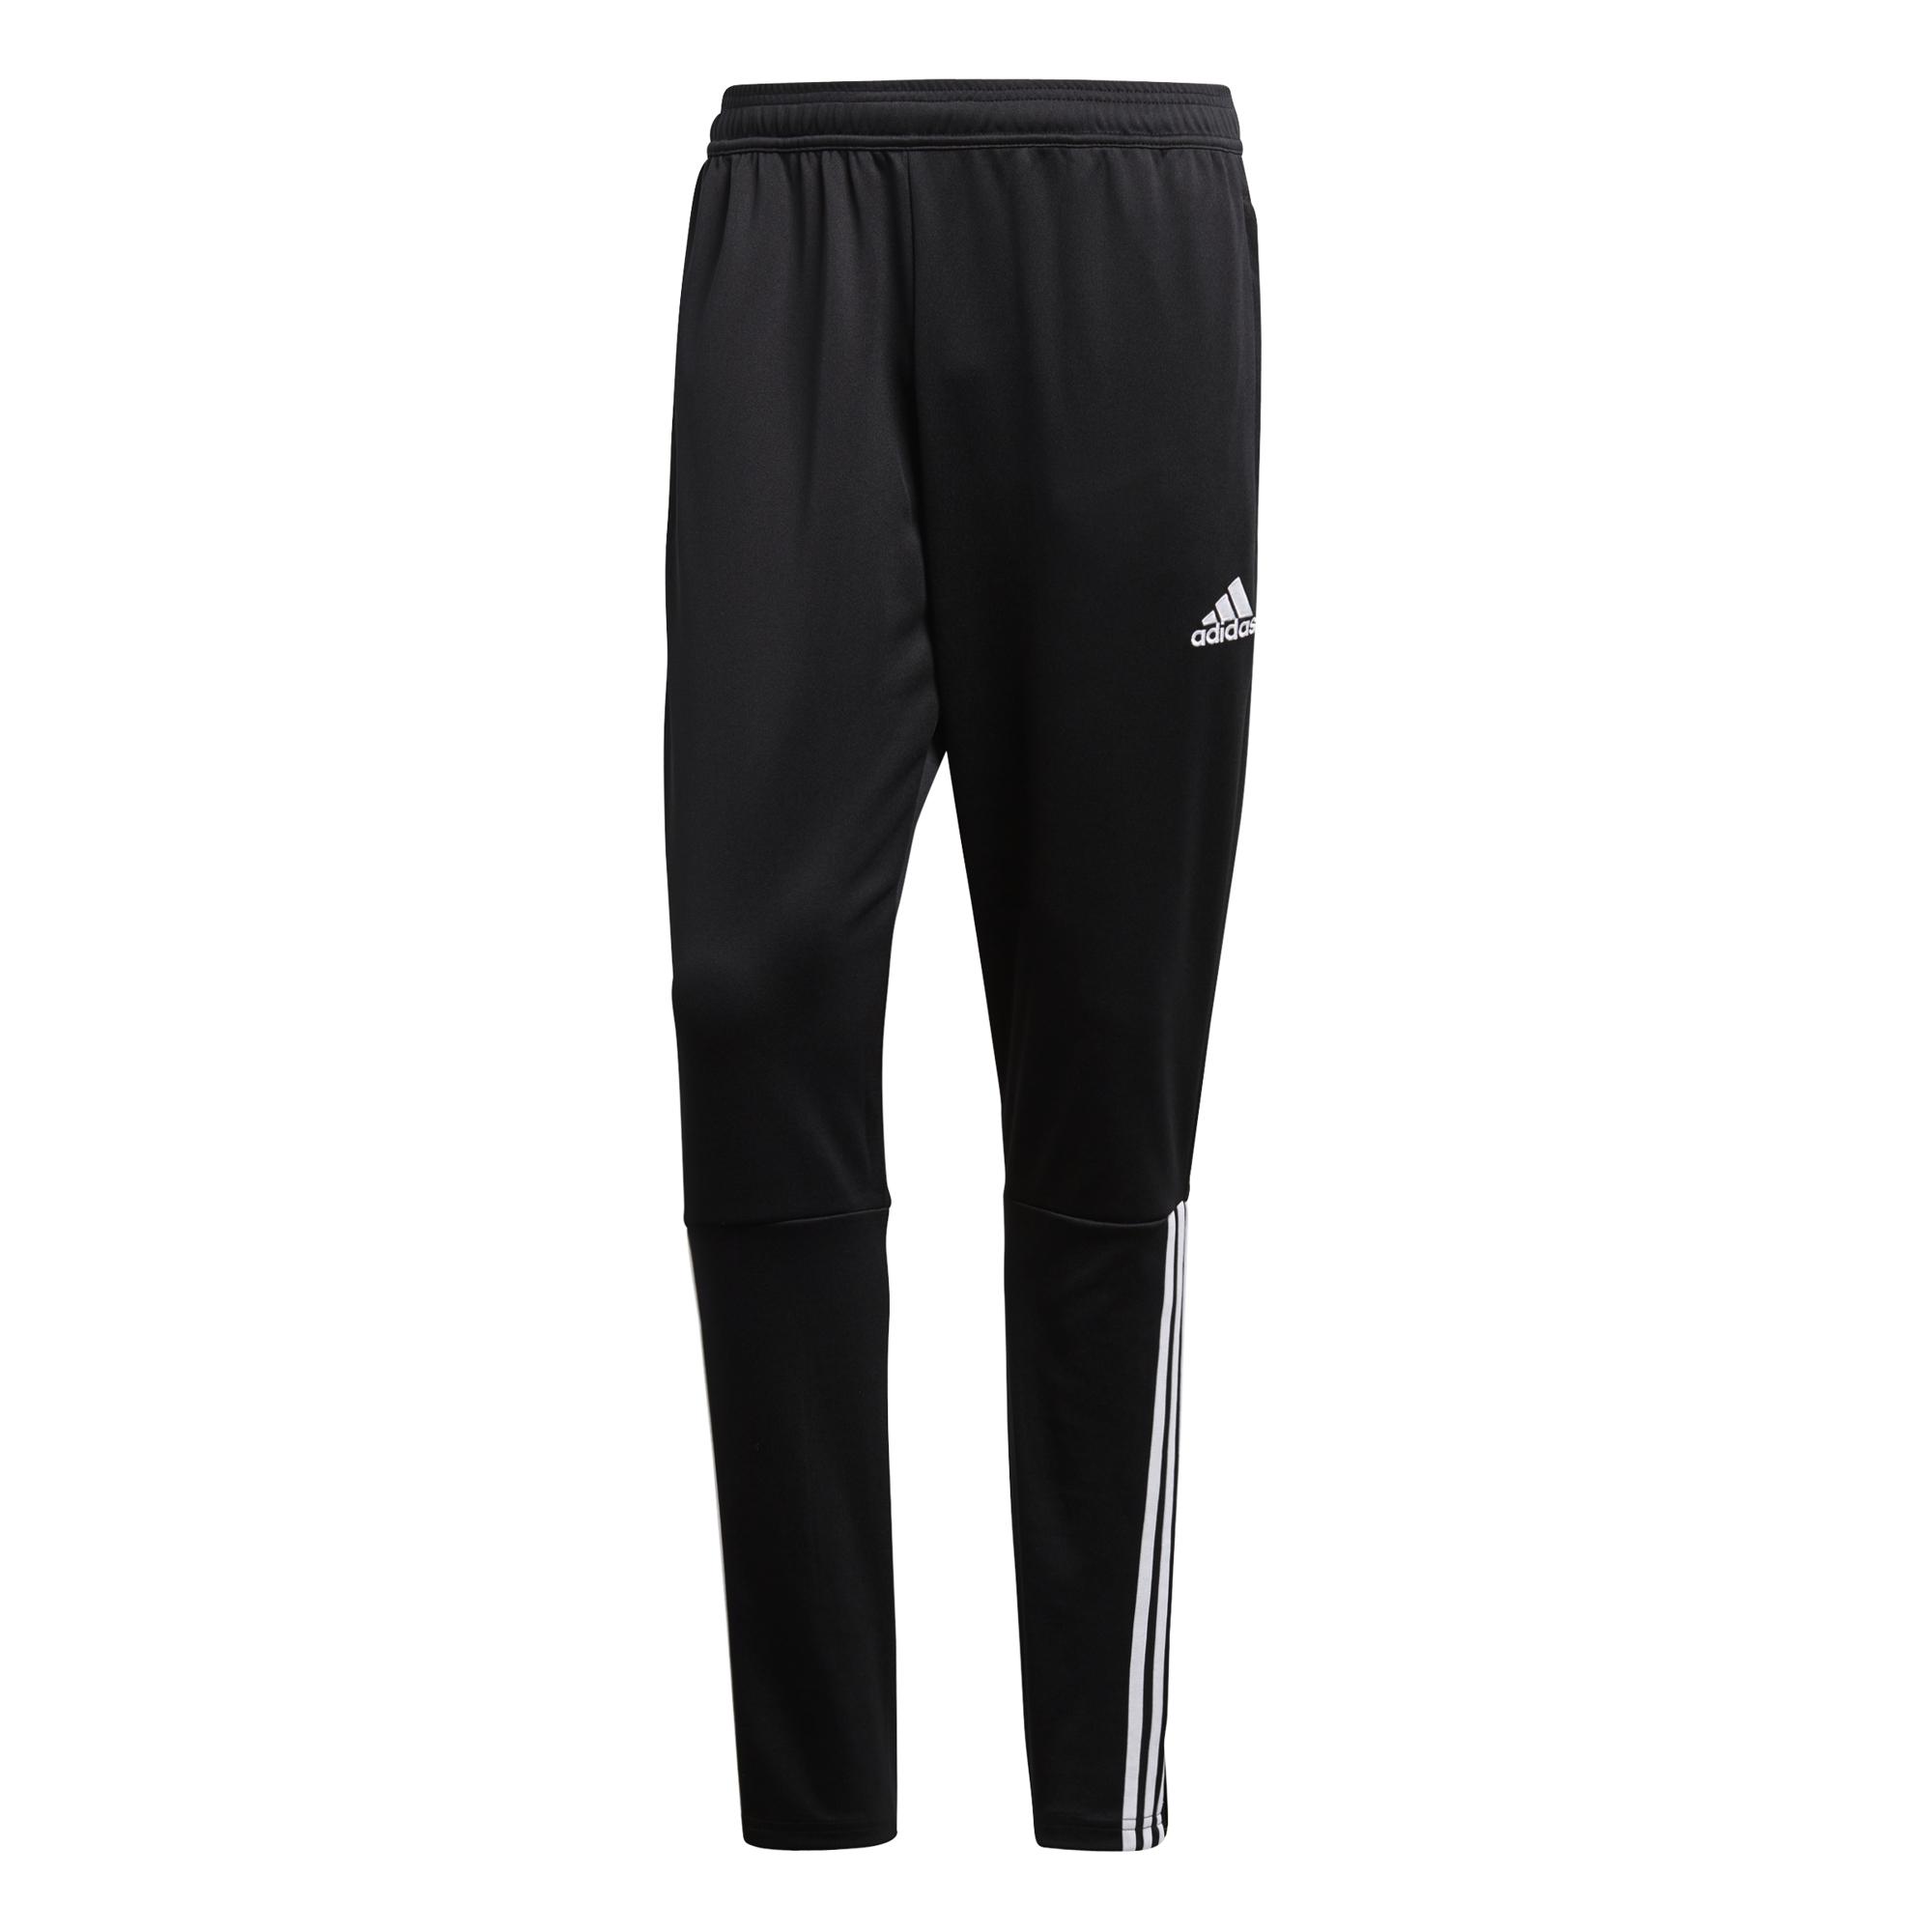 ADIDAS tréninkové kalhoty Regista 18